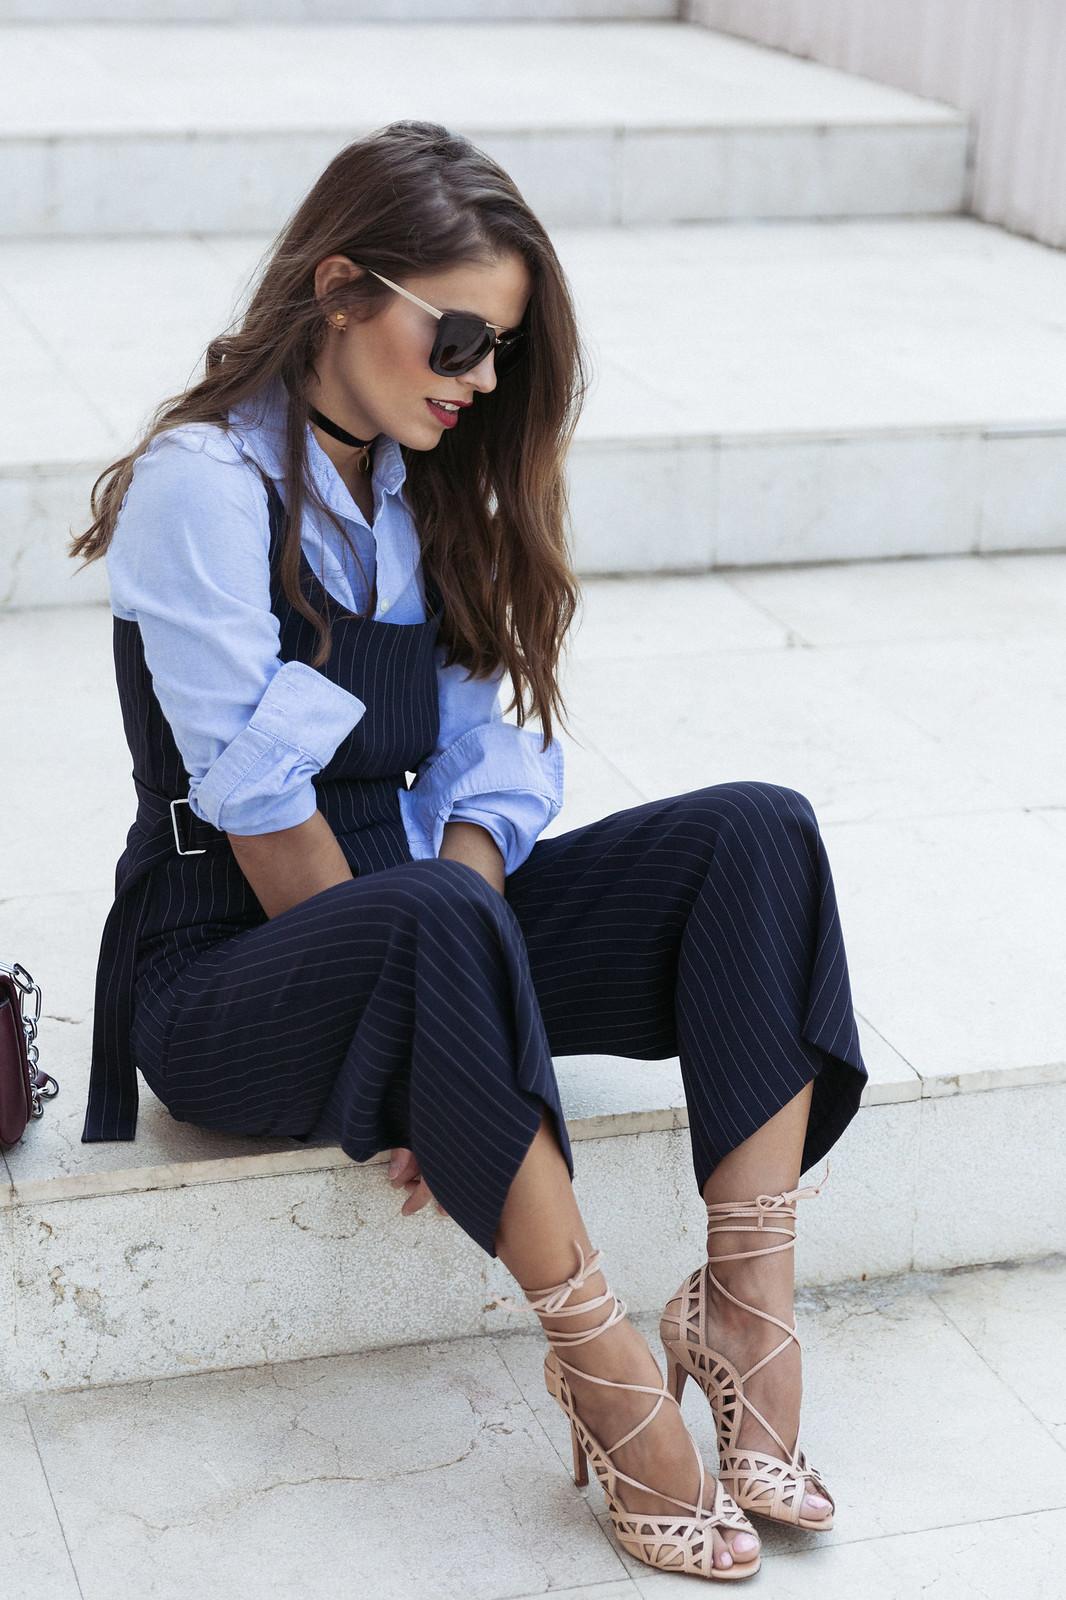 Jessie Chanes Seams for a desire - Pinstripped suit topshop heeled sandals schutz parfois bag  -6